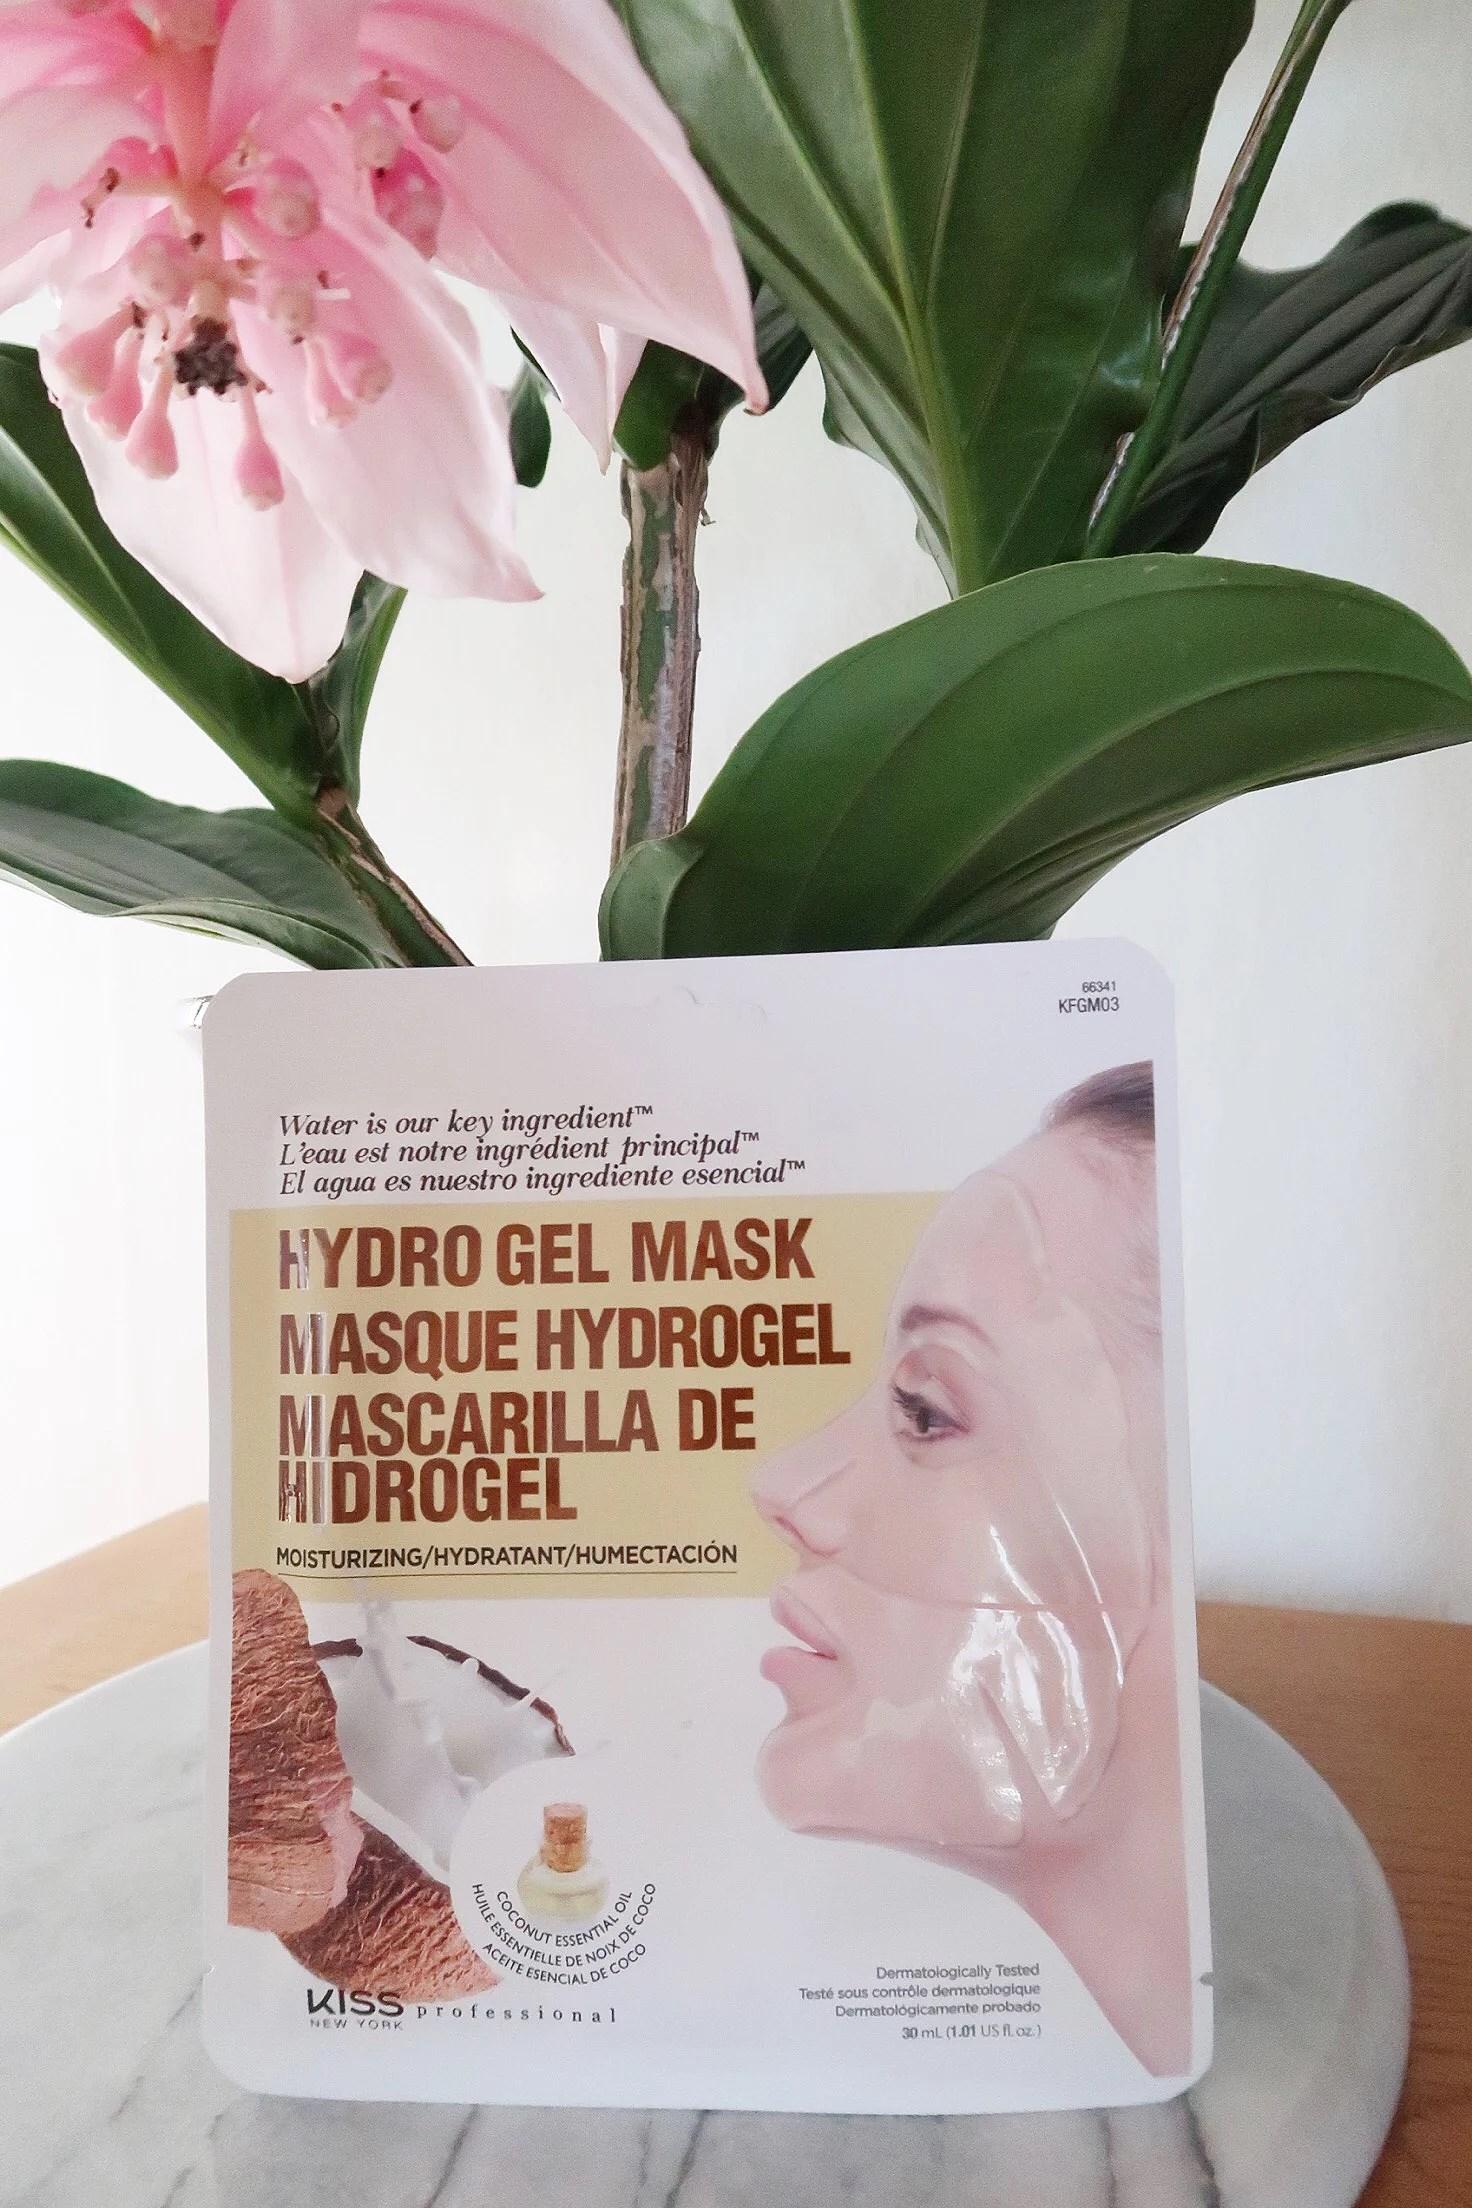 Hydrogel coconut mask!